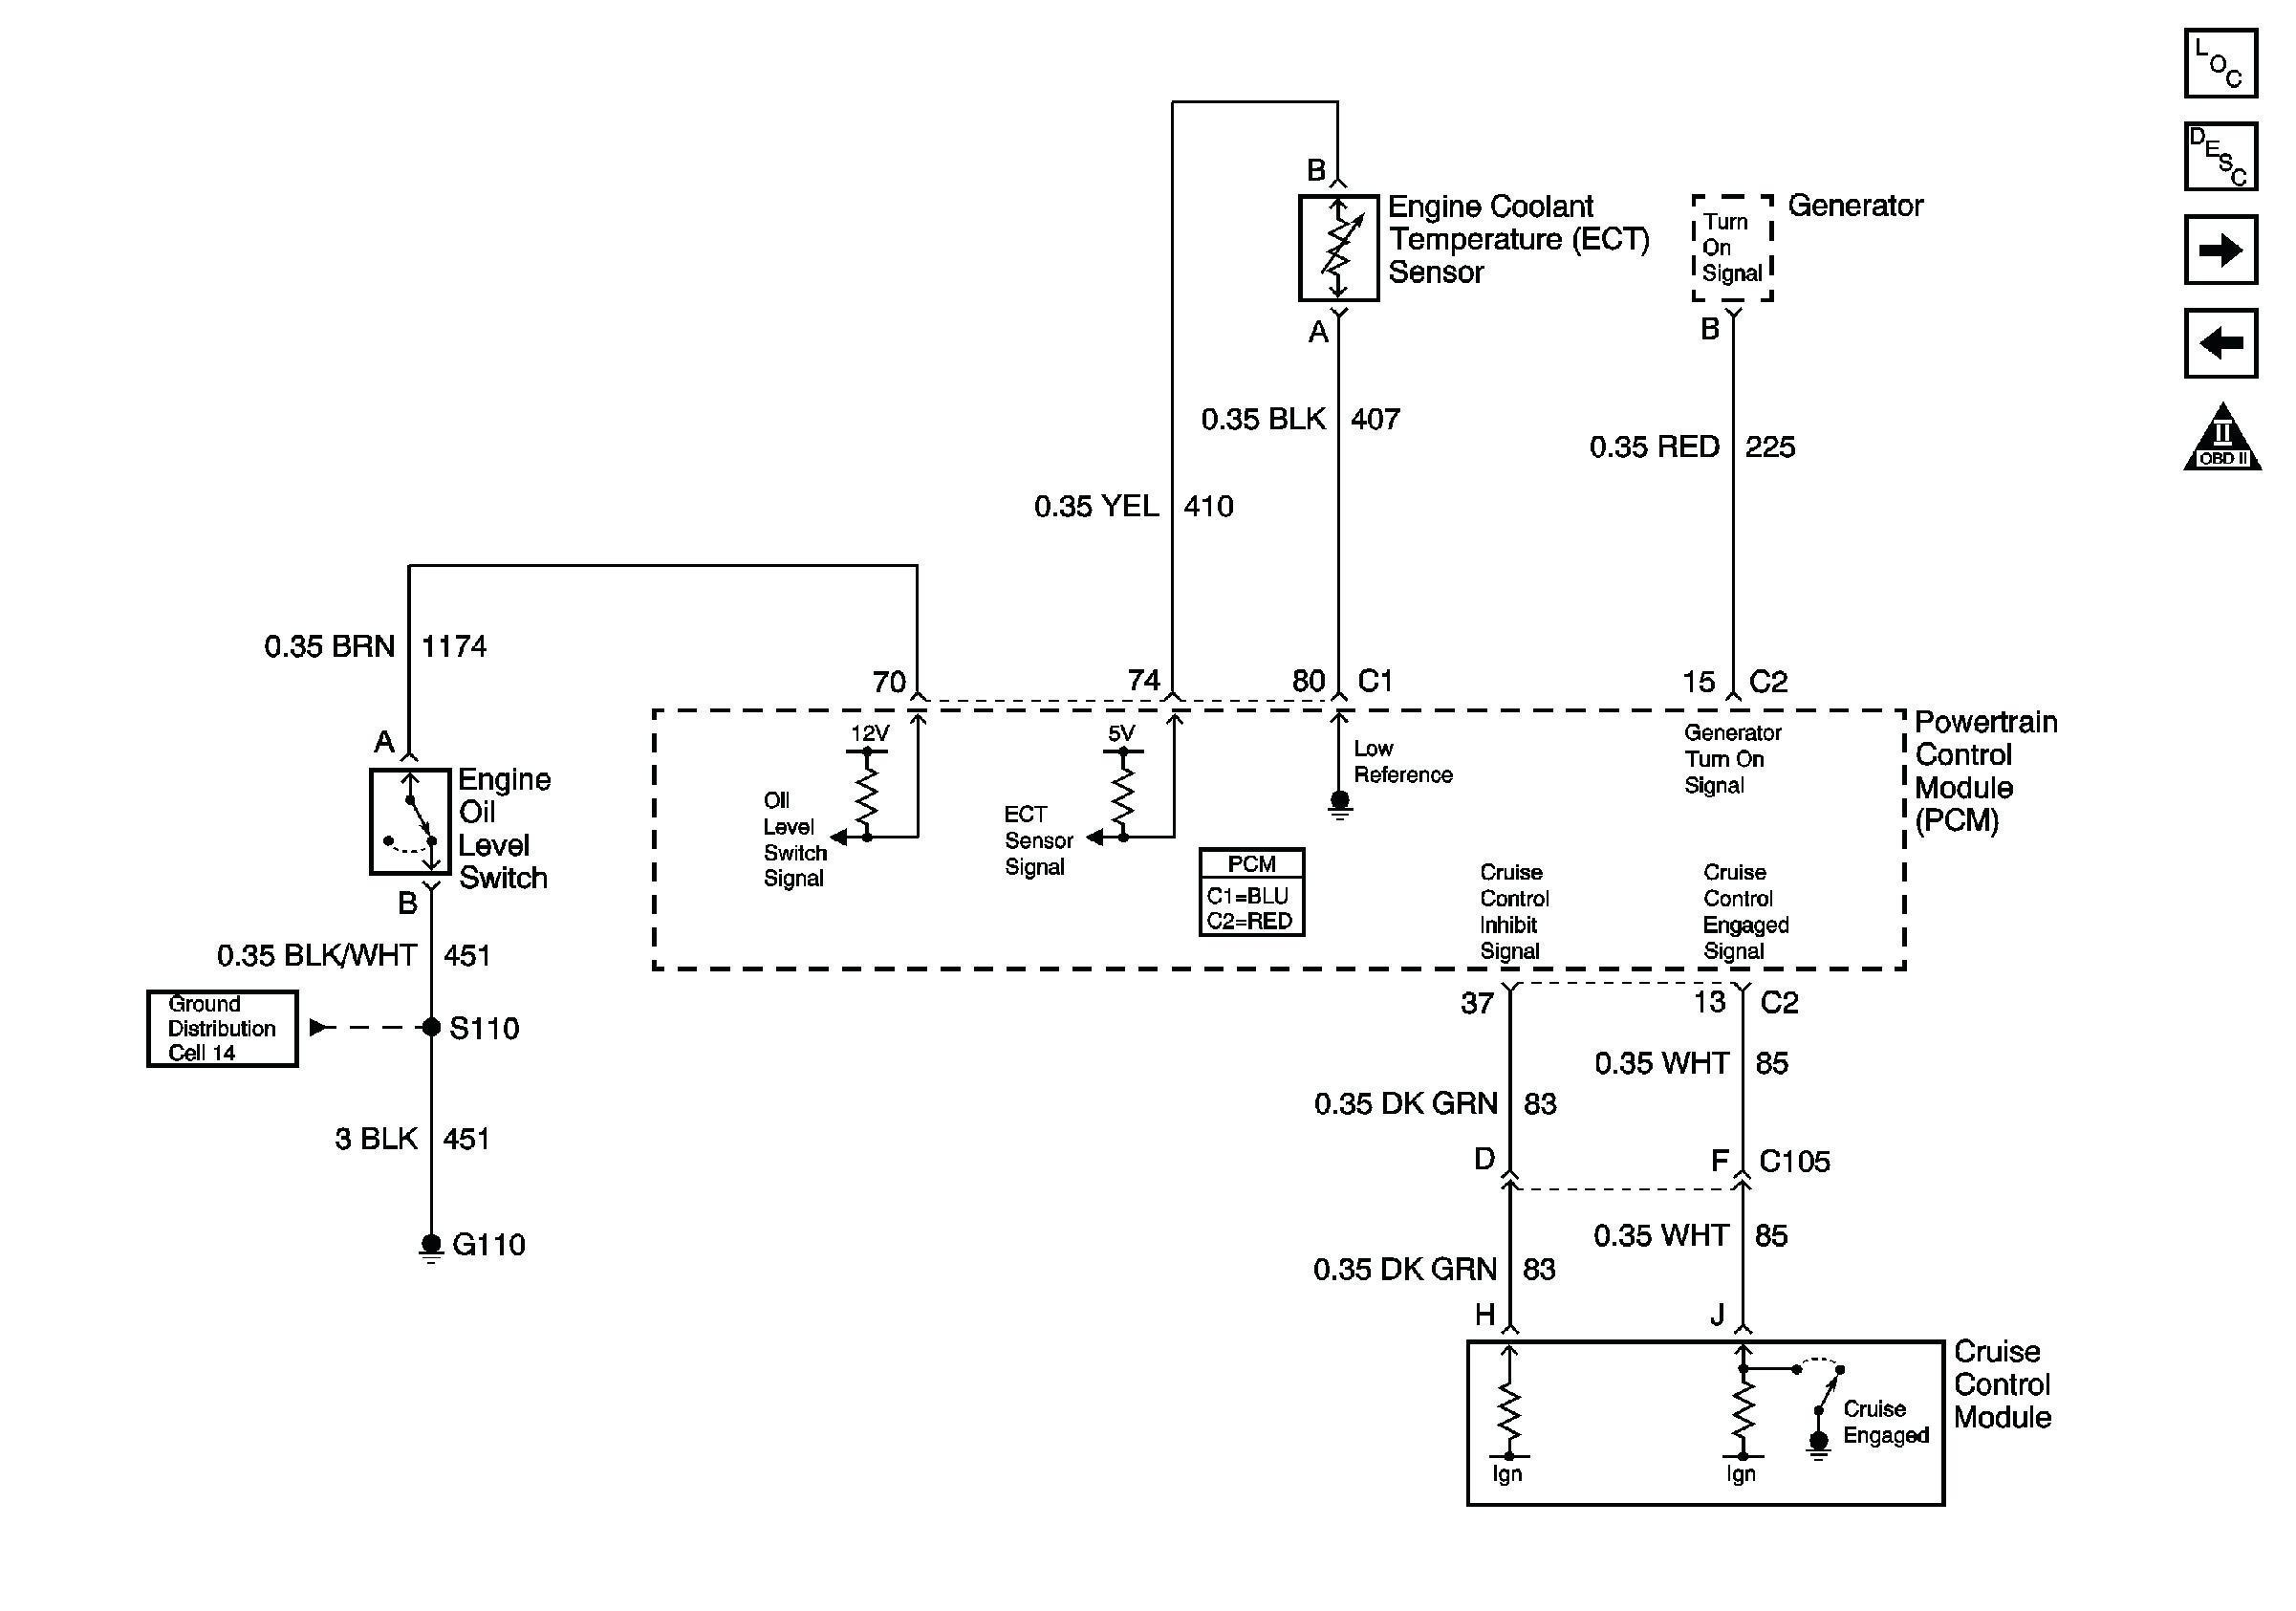 ac delco alternator wiring diagram Collection-Wiring Diagram For Ac Delco Alternator Valid Fresh 3 Wire Alternator Wiring Diagram Wiring 9-c